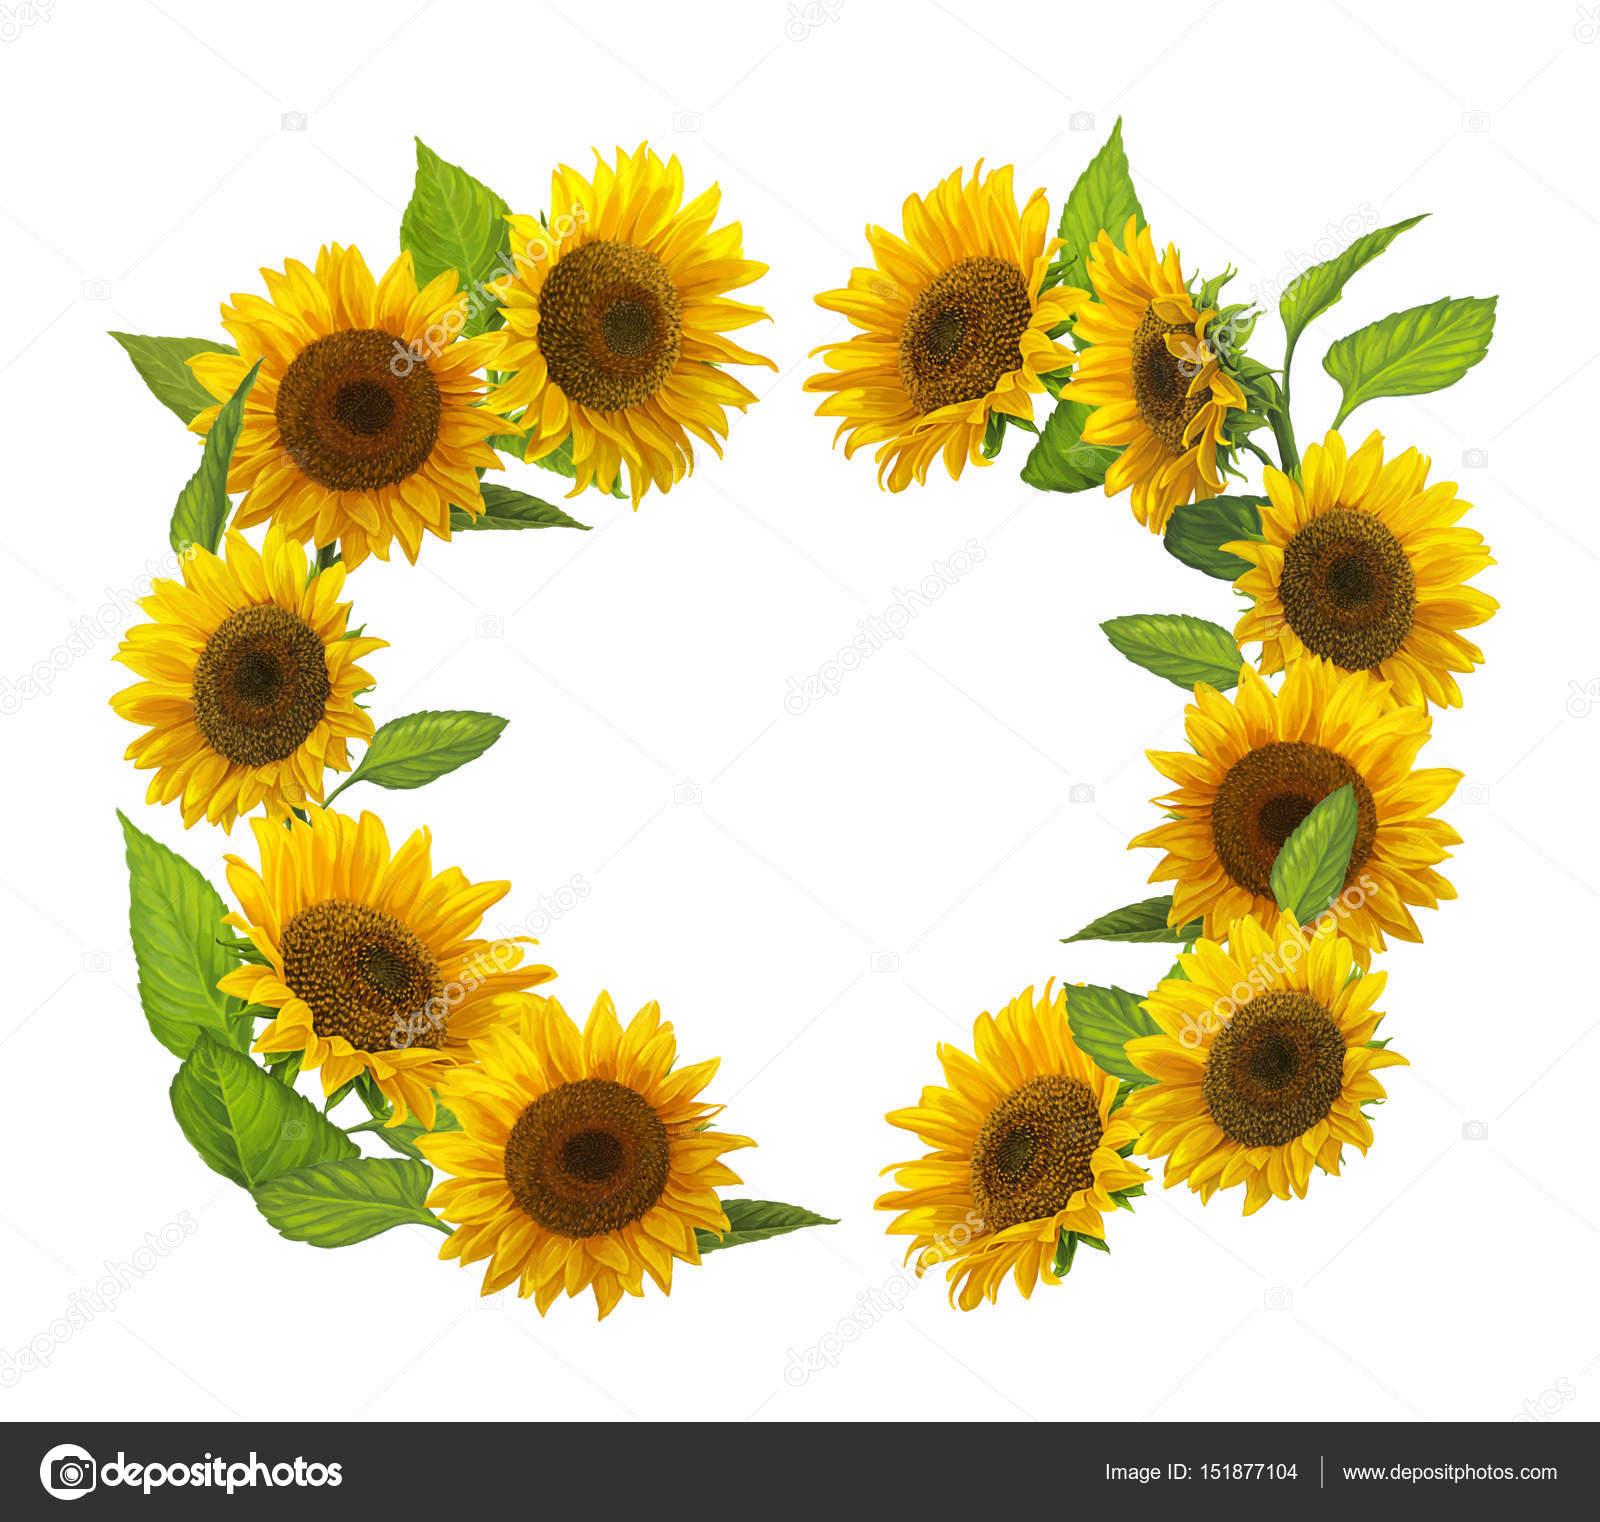 cartoon frame with sunflowers — Stock Photo © agaes8080 #151877104